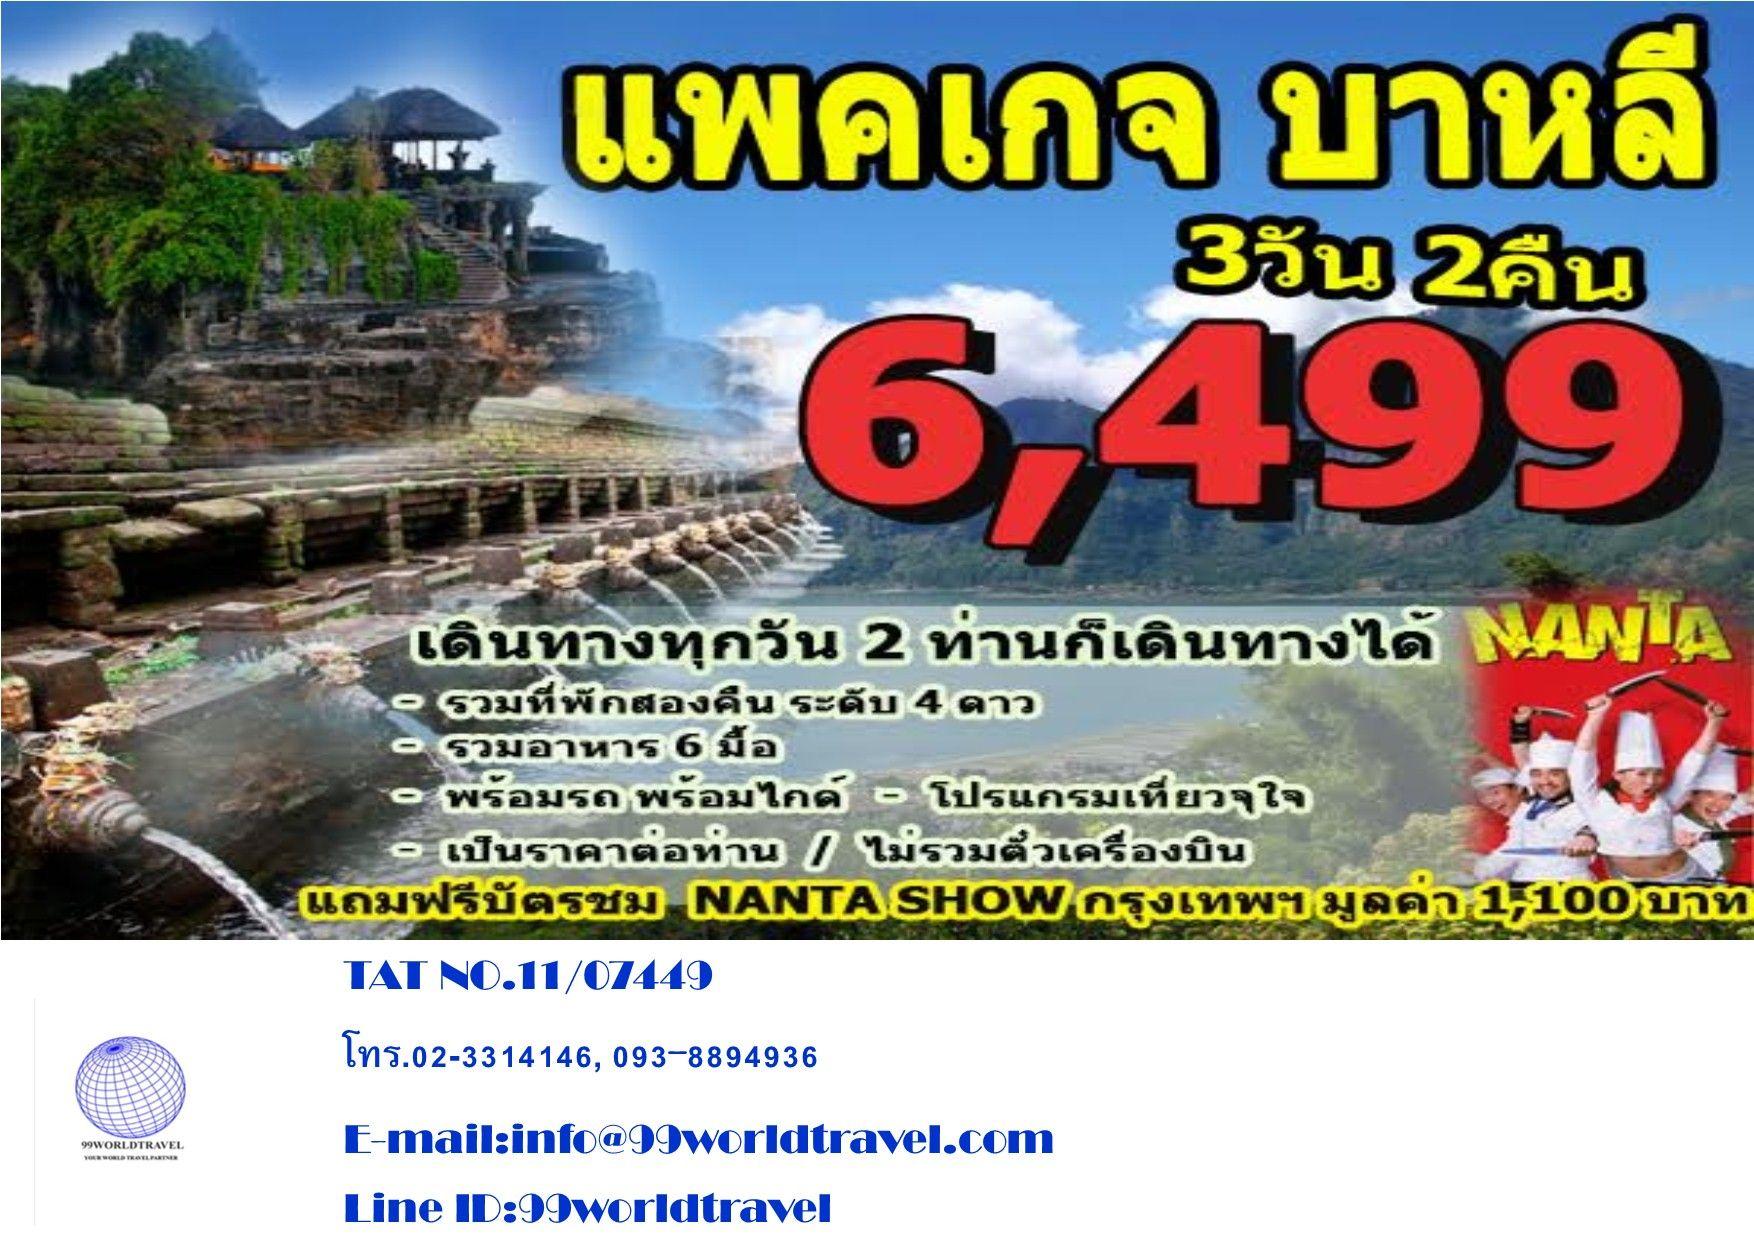 http://www.99worldtravel.com/Tour/Indonesia/view/2844 แพคเกจบาหลี 3 วัน 2 คืน #รับจัดทัวร์ #รับจัดทัวร์ต่างประเทศ #รับจัดทัวร์ในประเทศ #เก้า เก้า เวิลด์ ทราเวล #ตั๋วเครื่องบิน #วีซ่า #99worldtravel #Outbound #Air ticket #Visa #Hotel reservation #Inbound#Tour Outbound #ทัวร์เกาหลี #ทัวร์ญี่ปุ่น #ทัวร์ยุโรป #ทัวร์มาเลเซีย #ทัวร์สิงคโปร์ #ทัวร์อินเดีย #จองตั๋วเครื่องบิน #ทัวร์เนปาล #ทัวร์พม่า #ทัวร์ลาว #ทัวร์บาหลี #ทัวร์อินโดนีเซีย #ทัวร์อเมริกา 